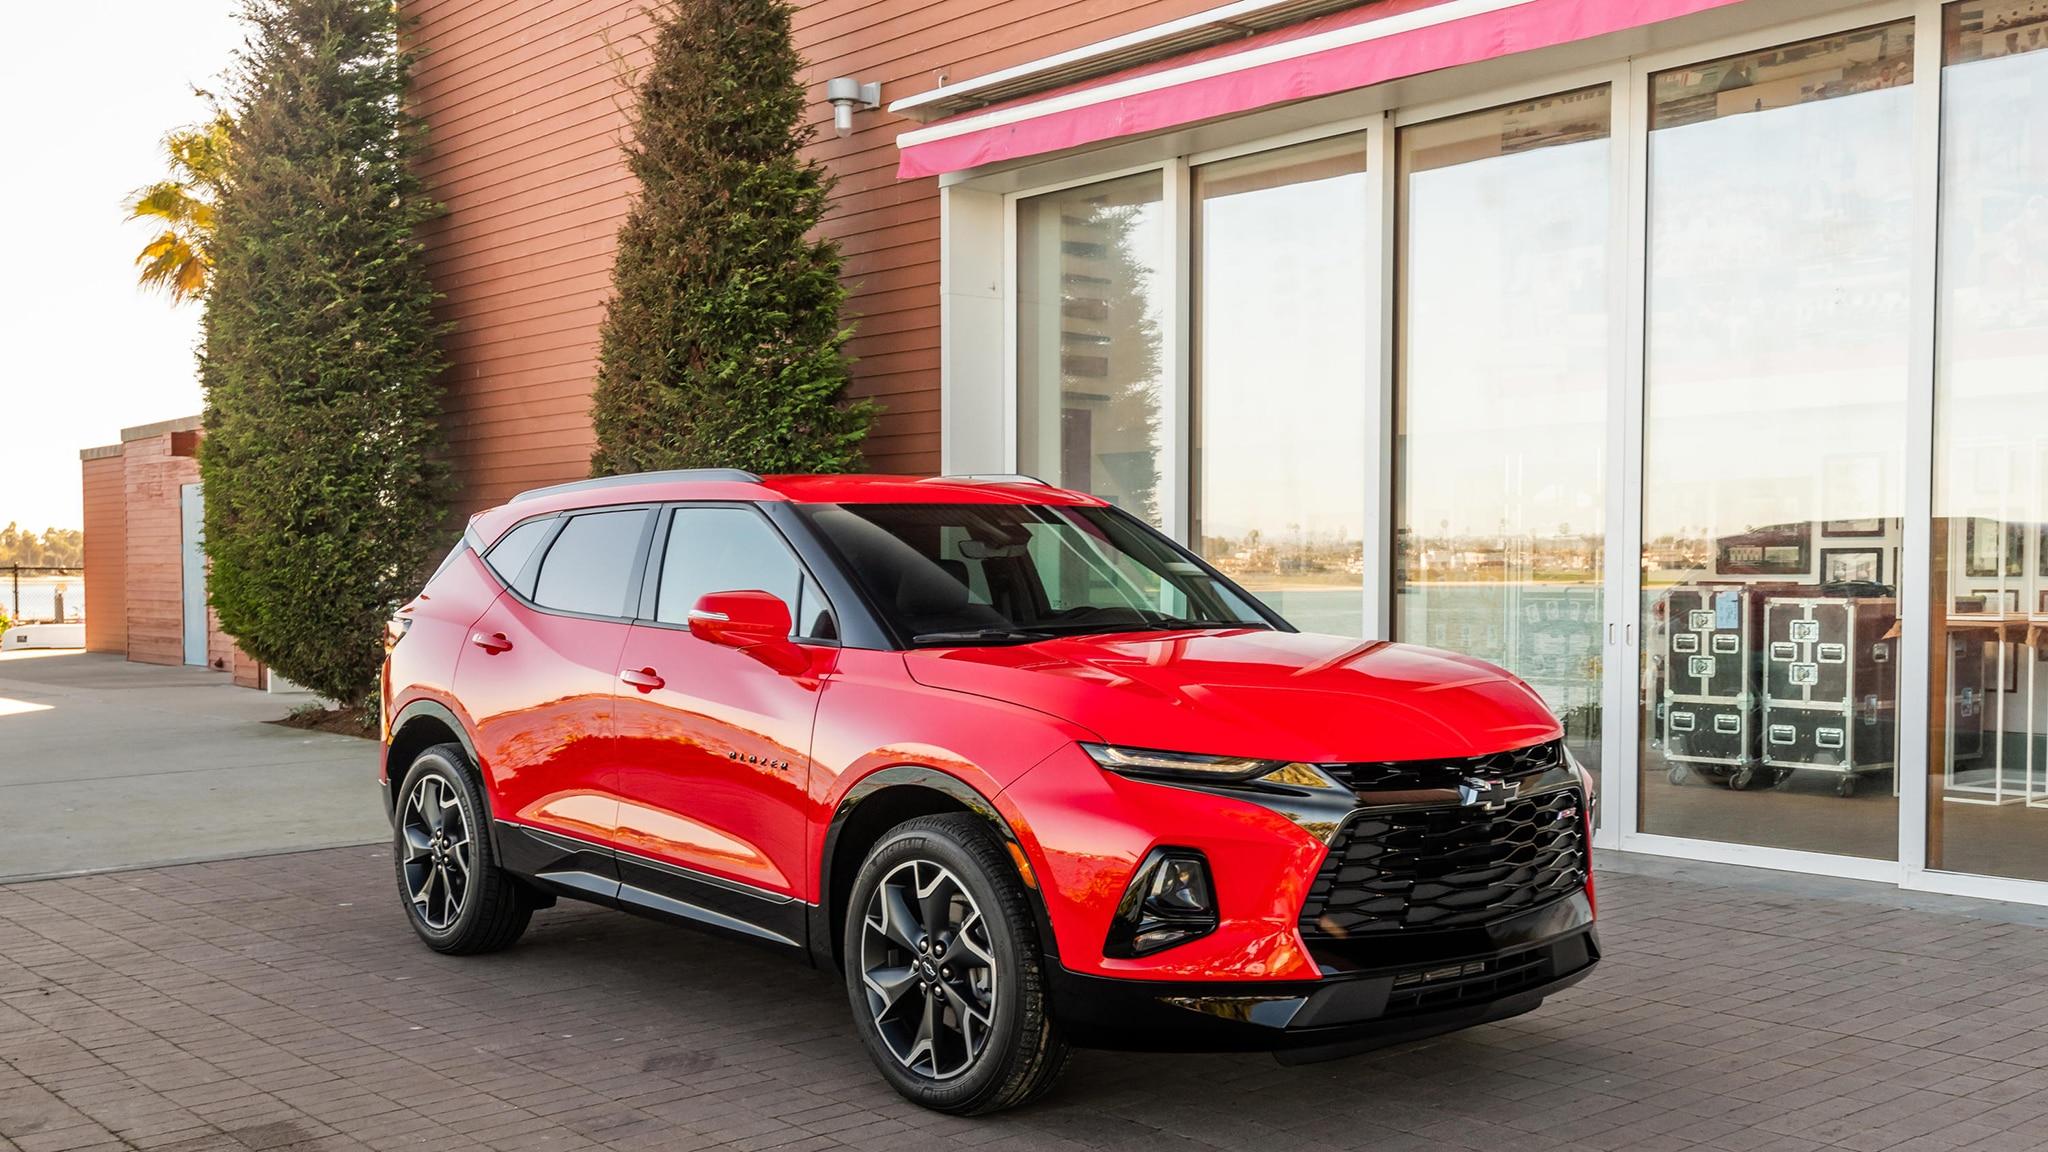 2019-Chevrolet-Blazer-RS-25.jpg